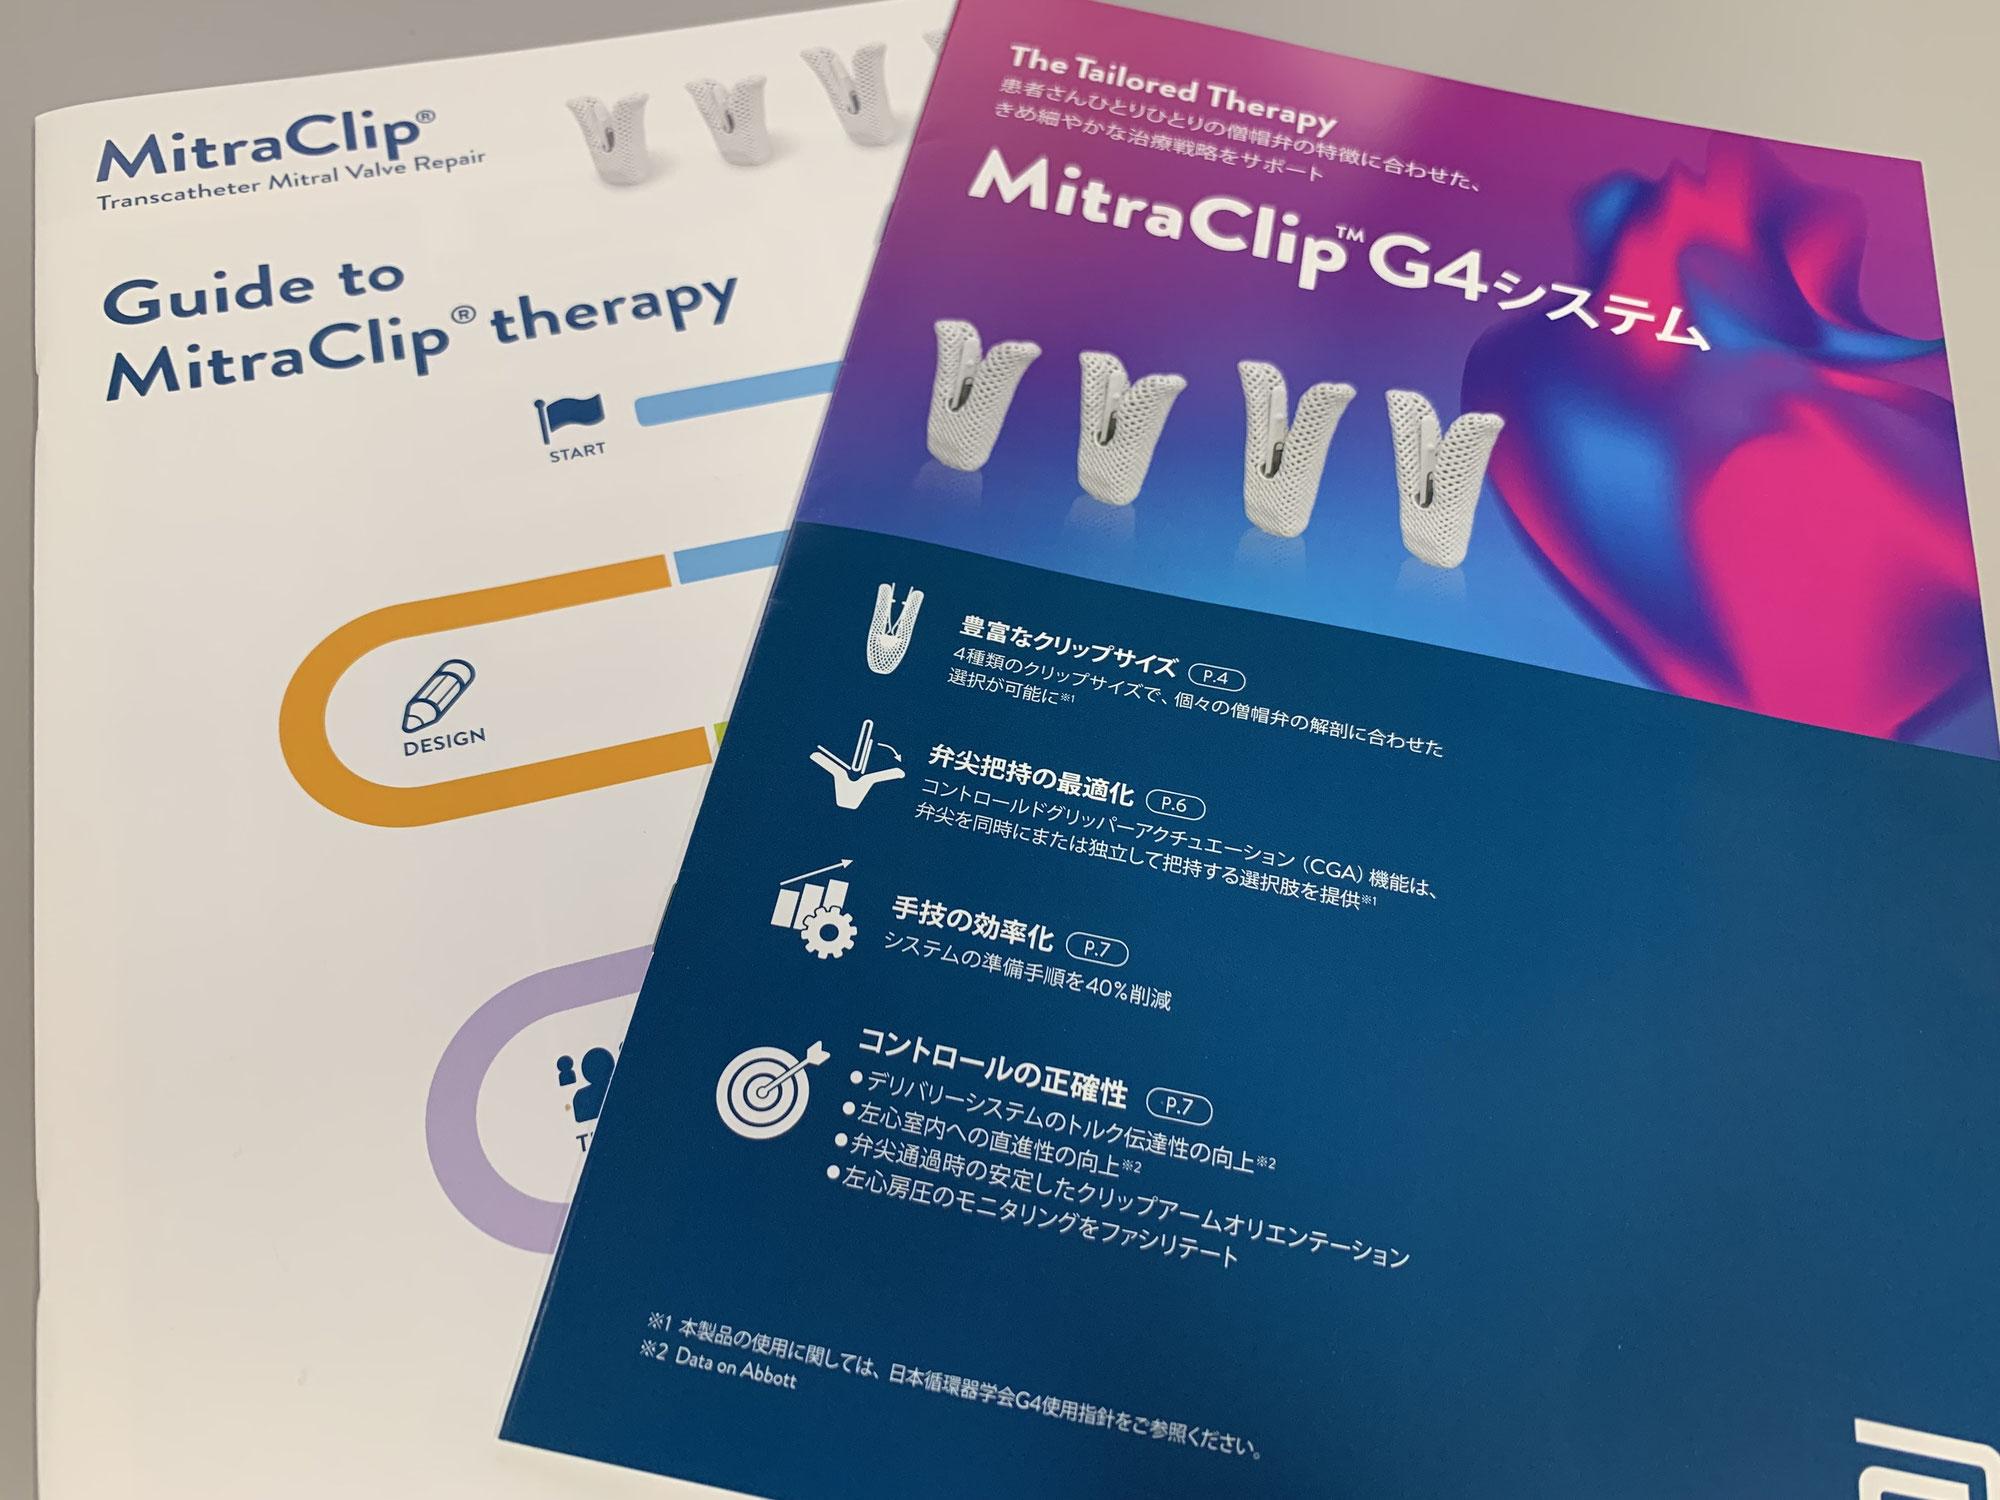 MitraClipキックオフミーティング開催